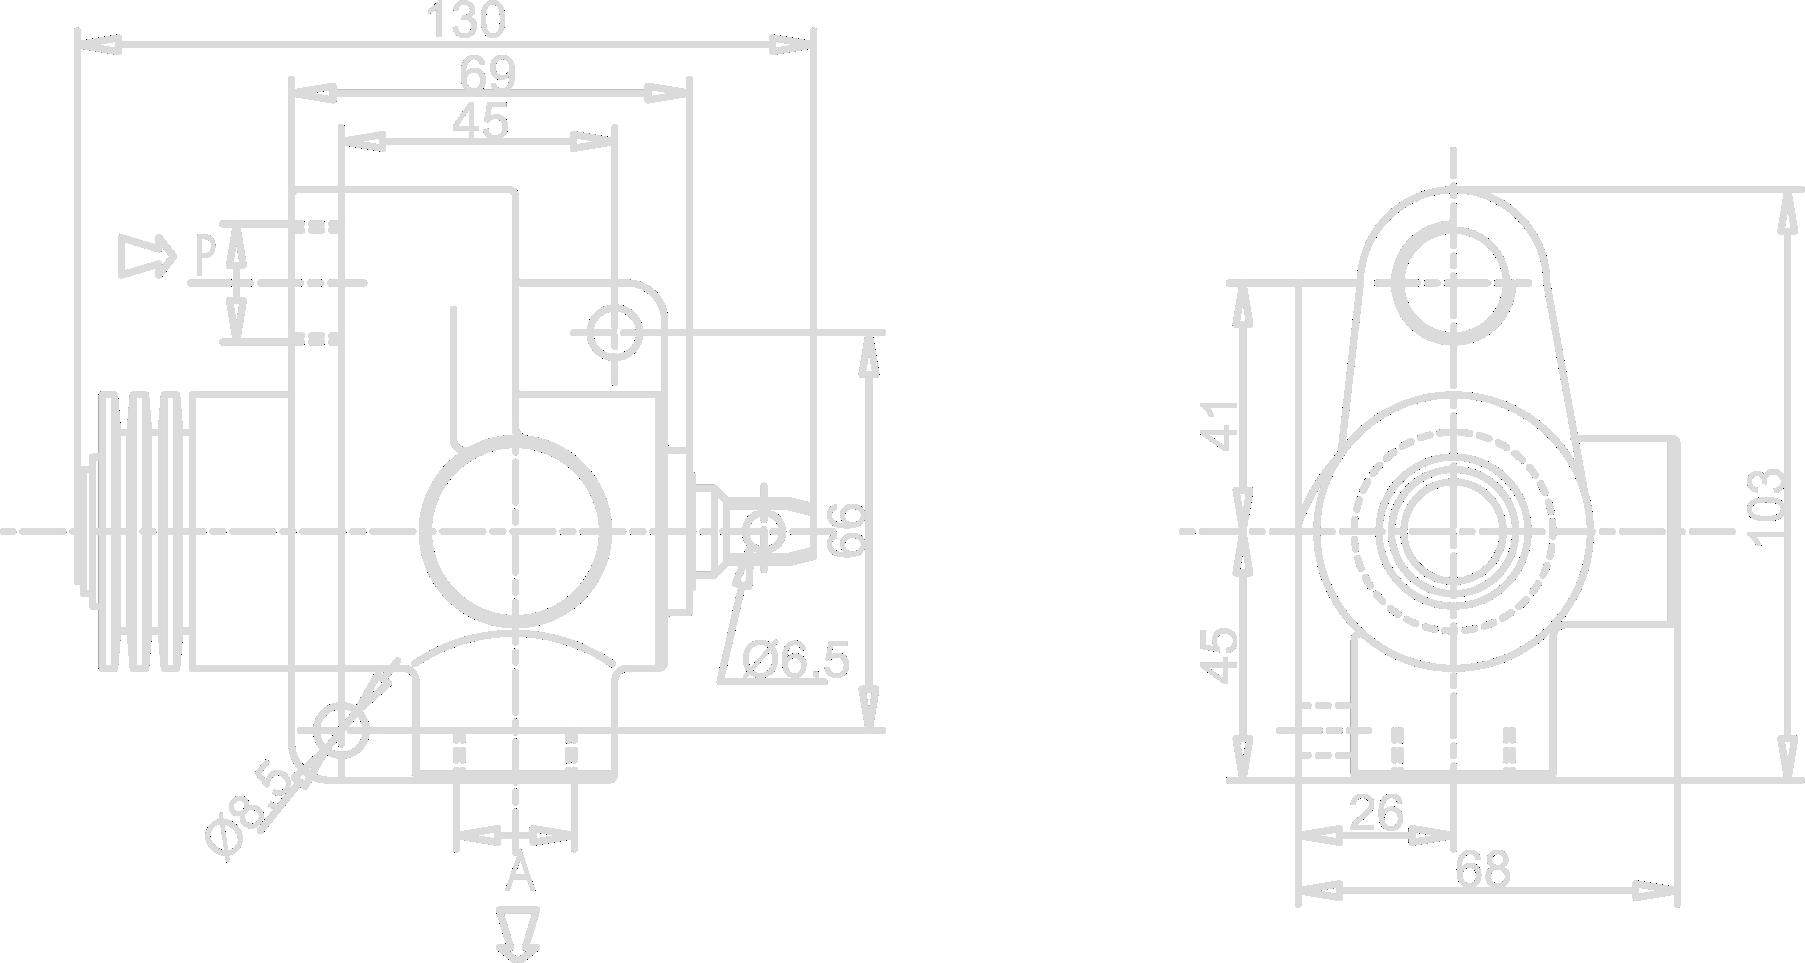 We Move Your World Hyva Hgv Trailer Wiring Diagram Uk Image